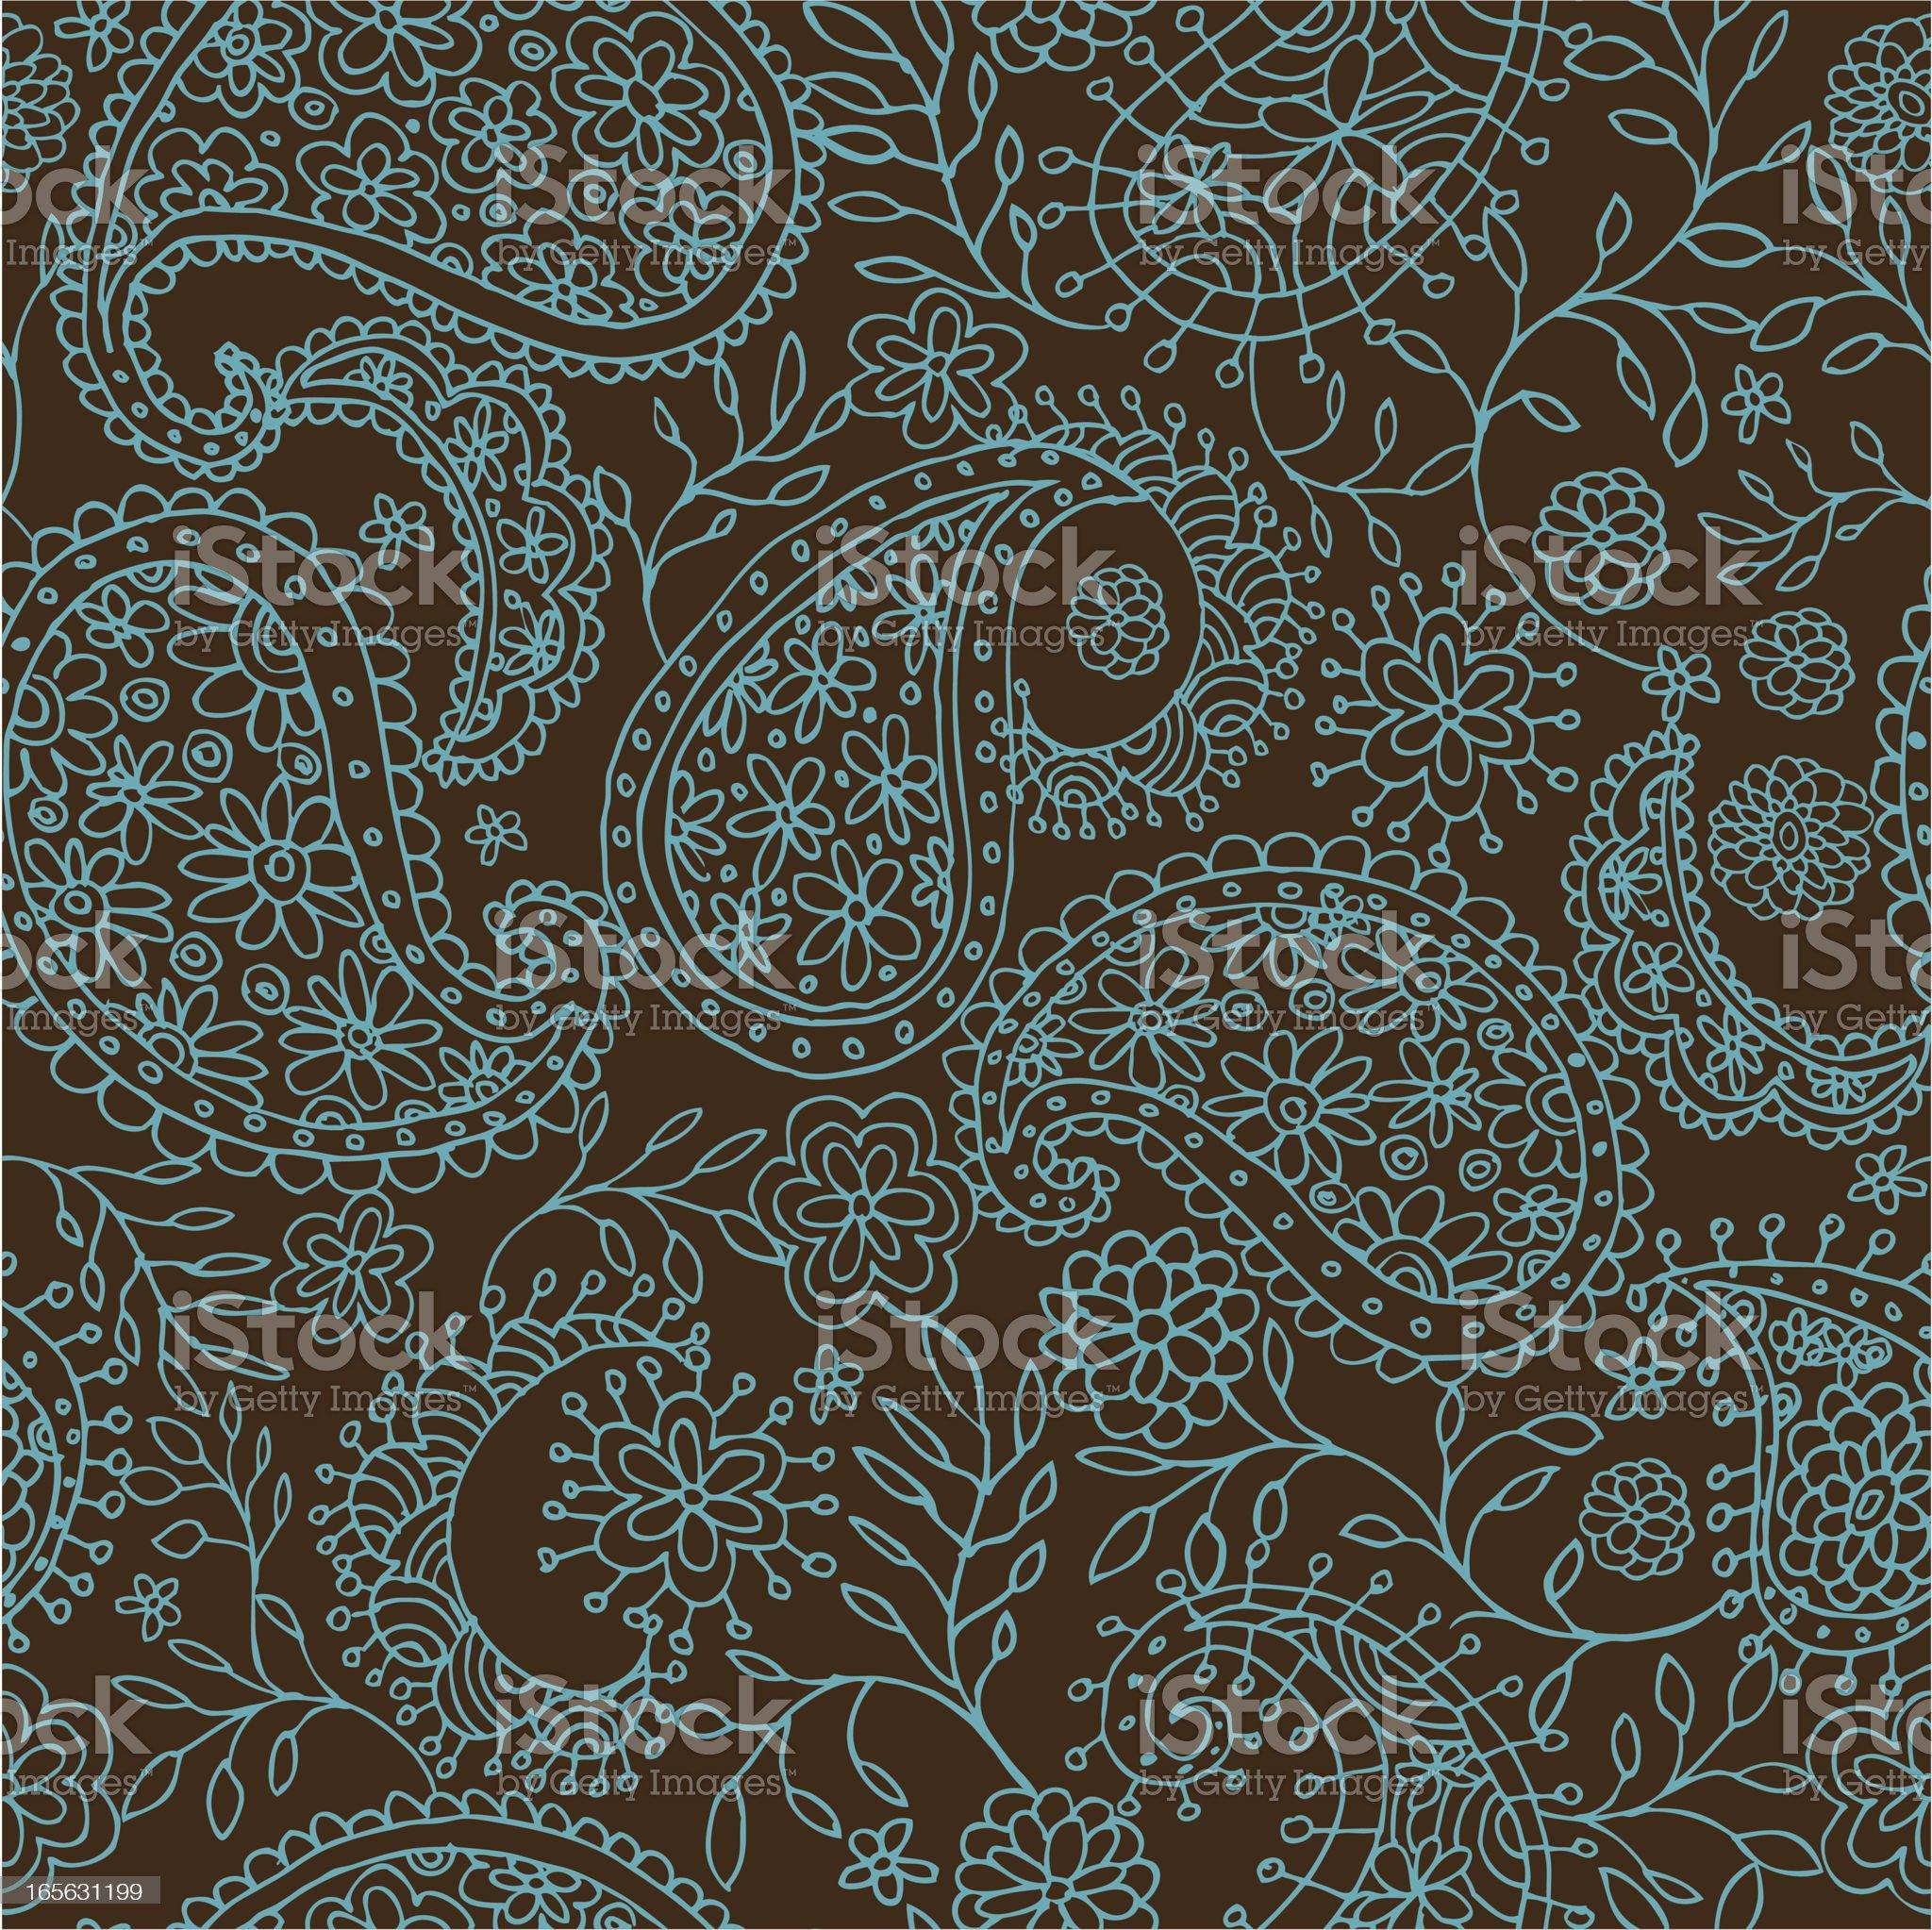 Paisley Seamless Pattern royalty-free stock vector art